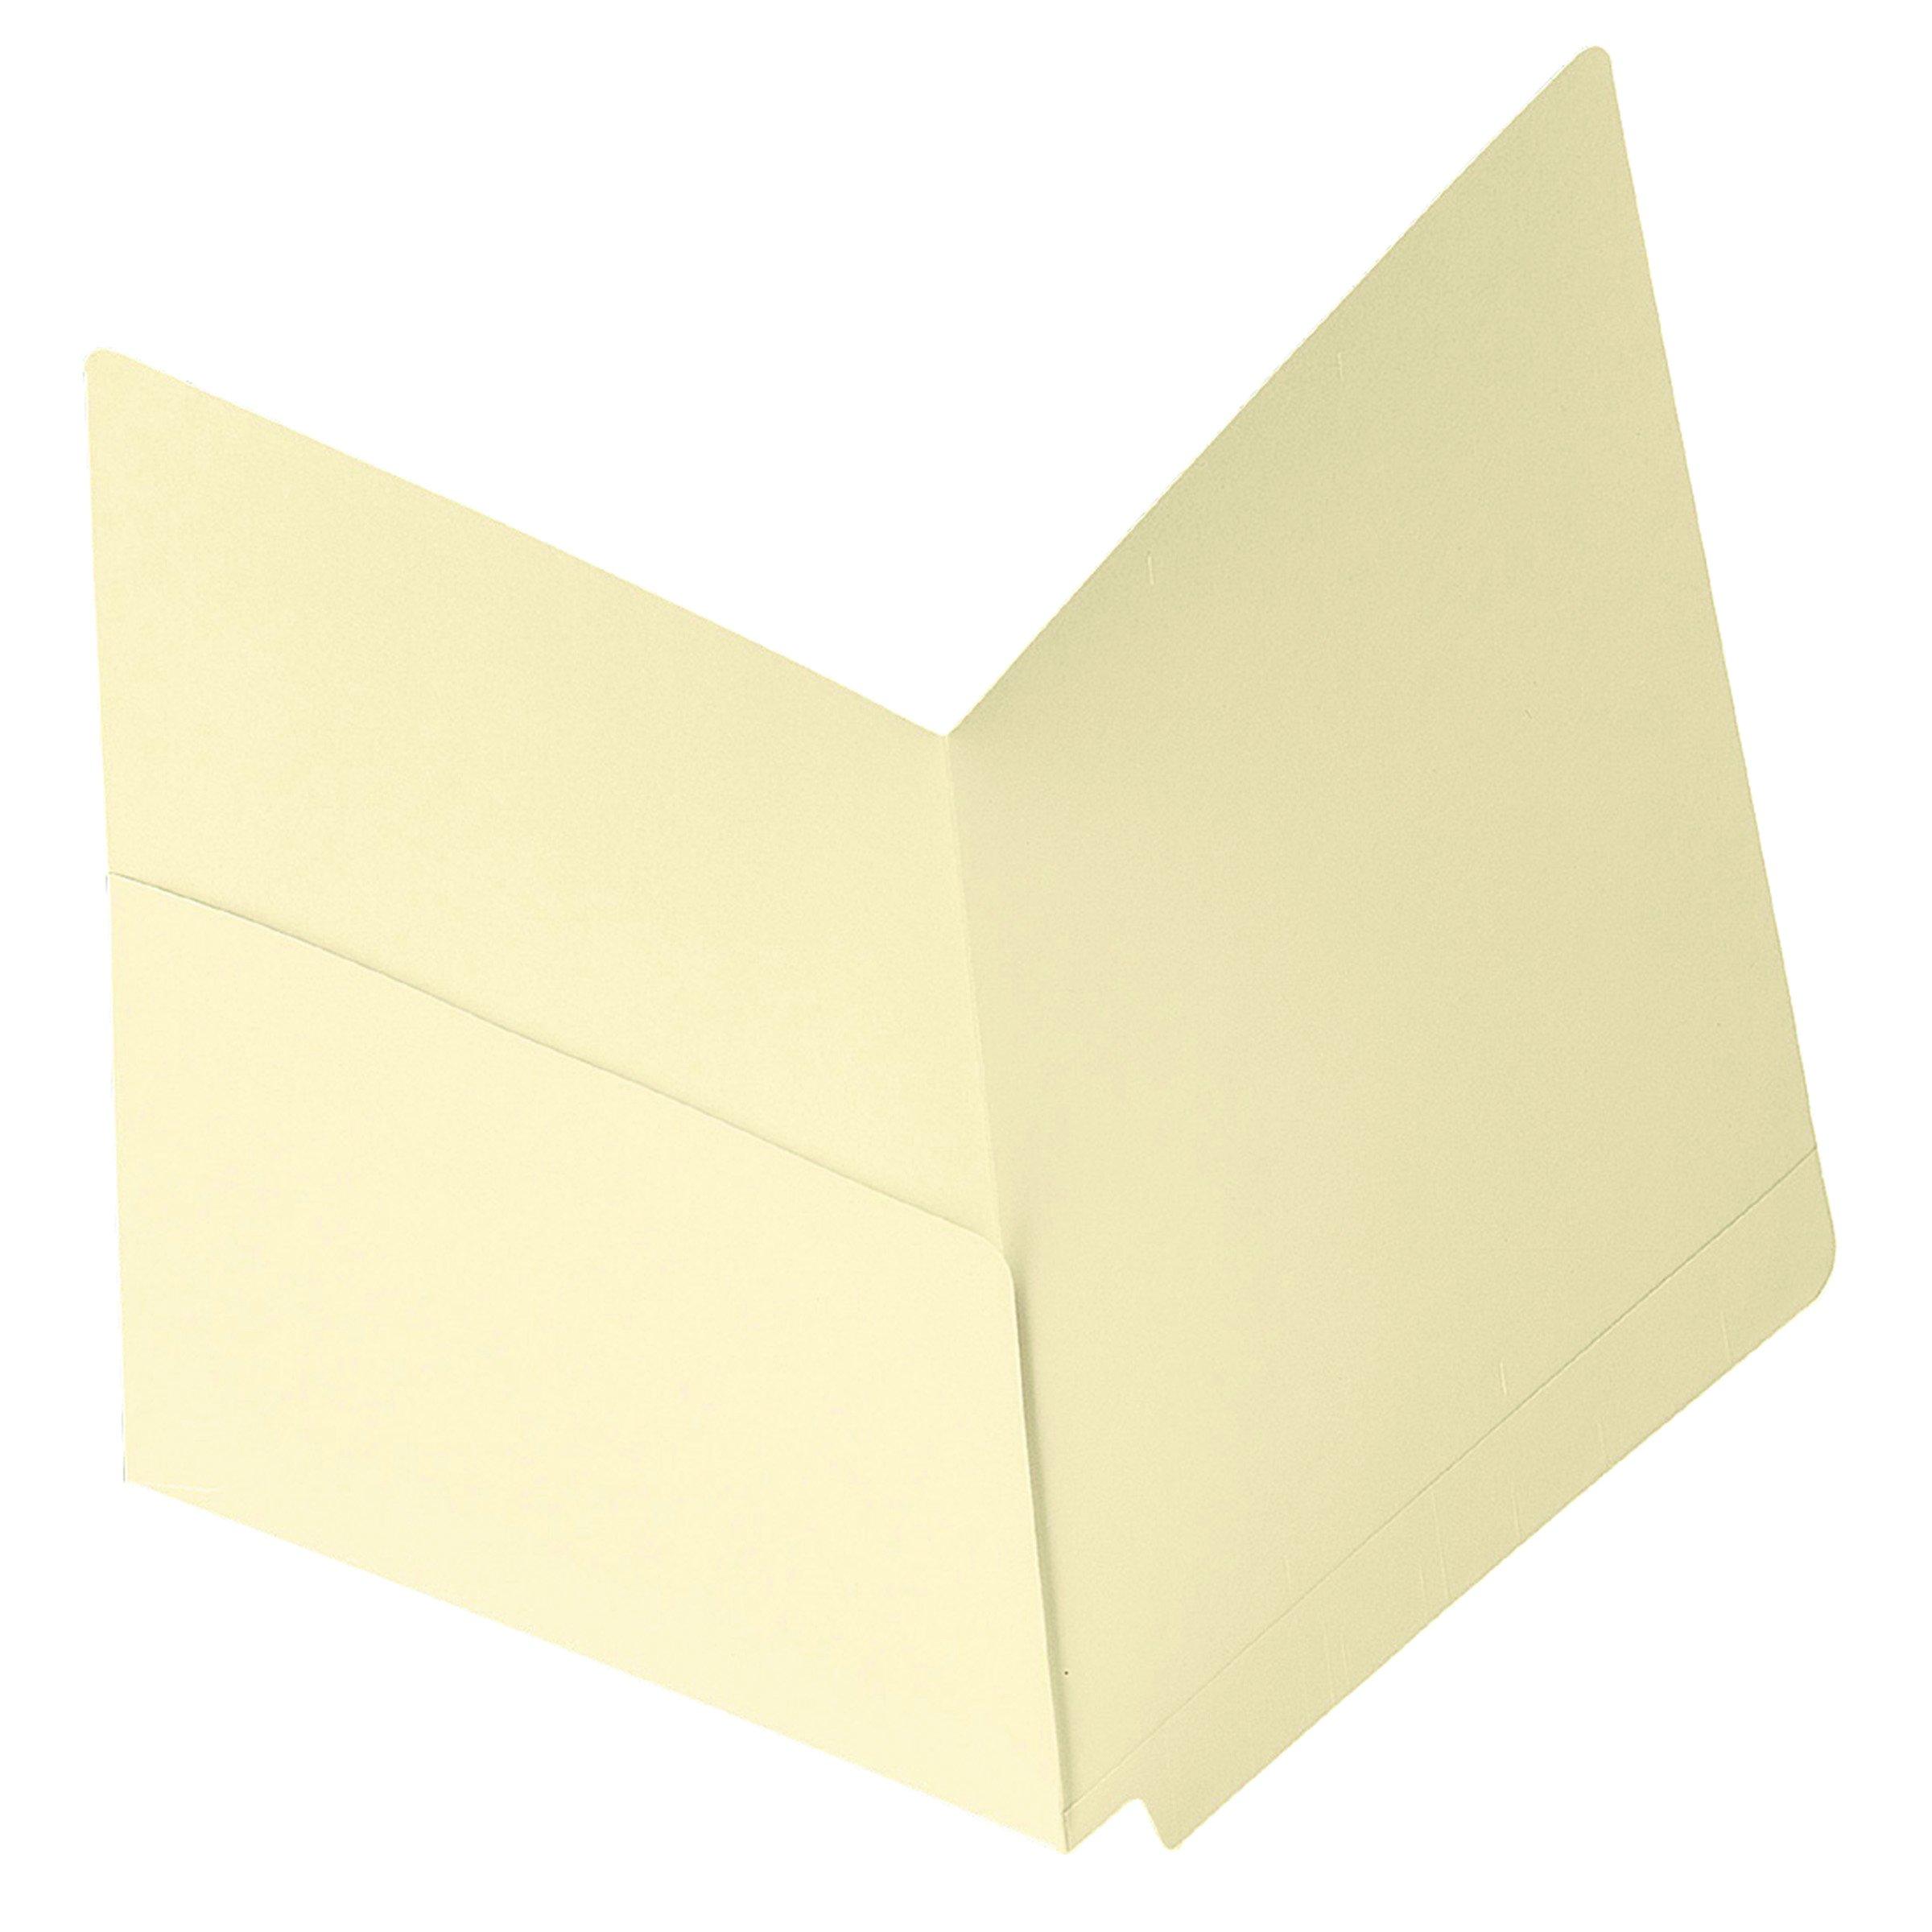 Smead End Tab File Pocket, Shelf-Master Reinforced Straight-Cut Tab, 1 Pocket, Letter Size, Manila, 50 per Box (24115) by Smead